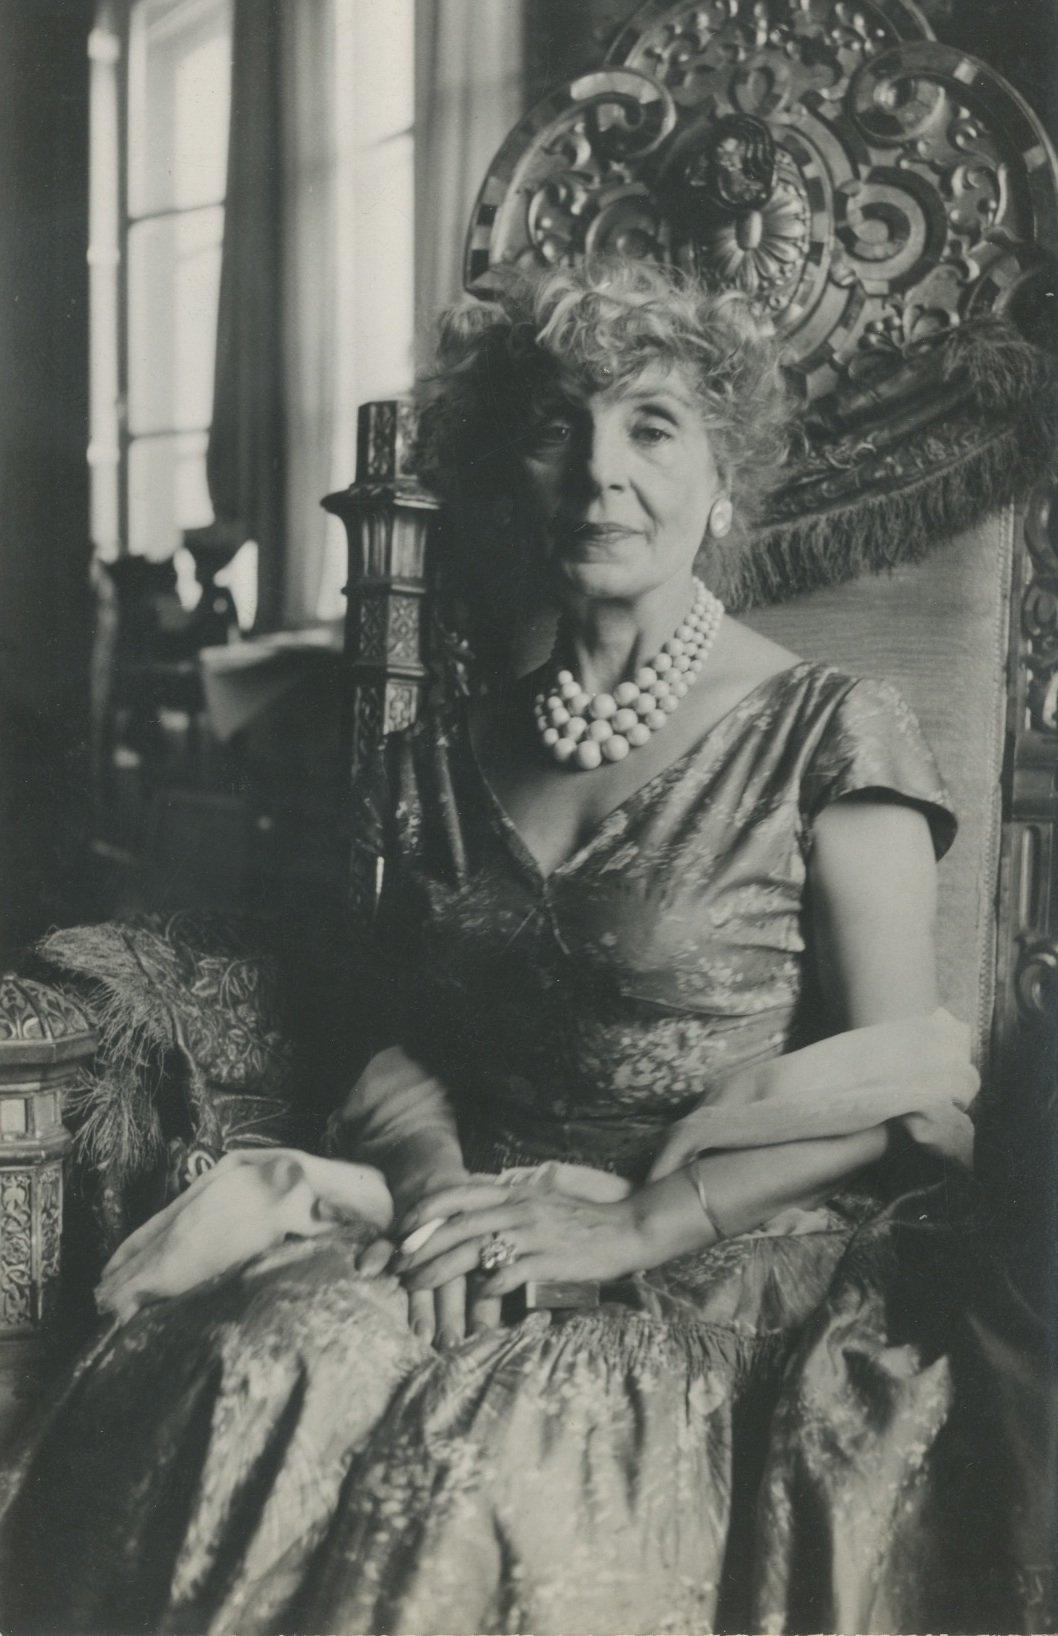 Aliye Berger was a member of the famed artistic Kabaağaçlı family. (Courtesy of SALT Research)